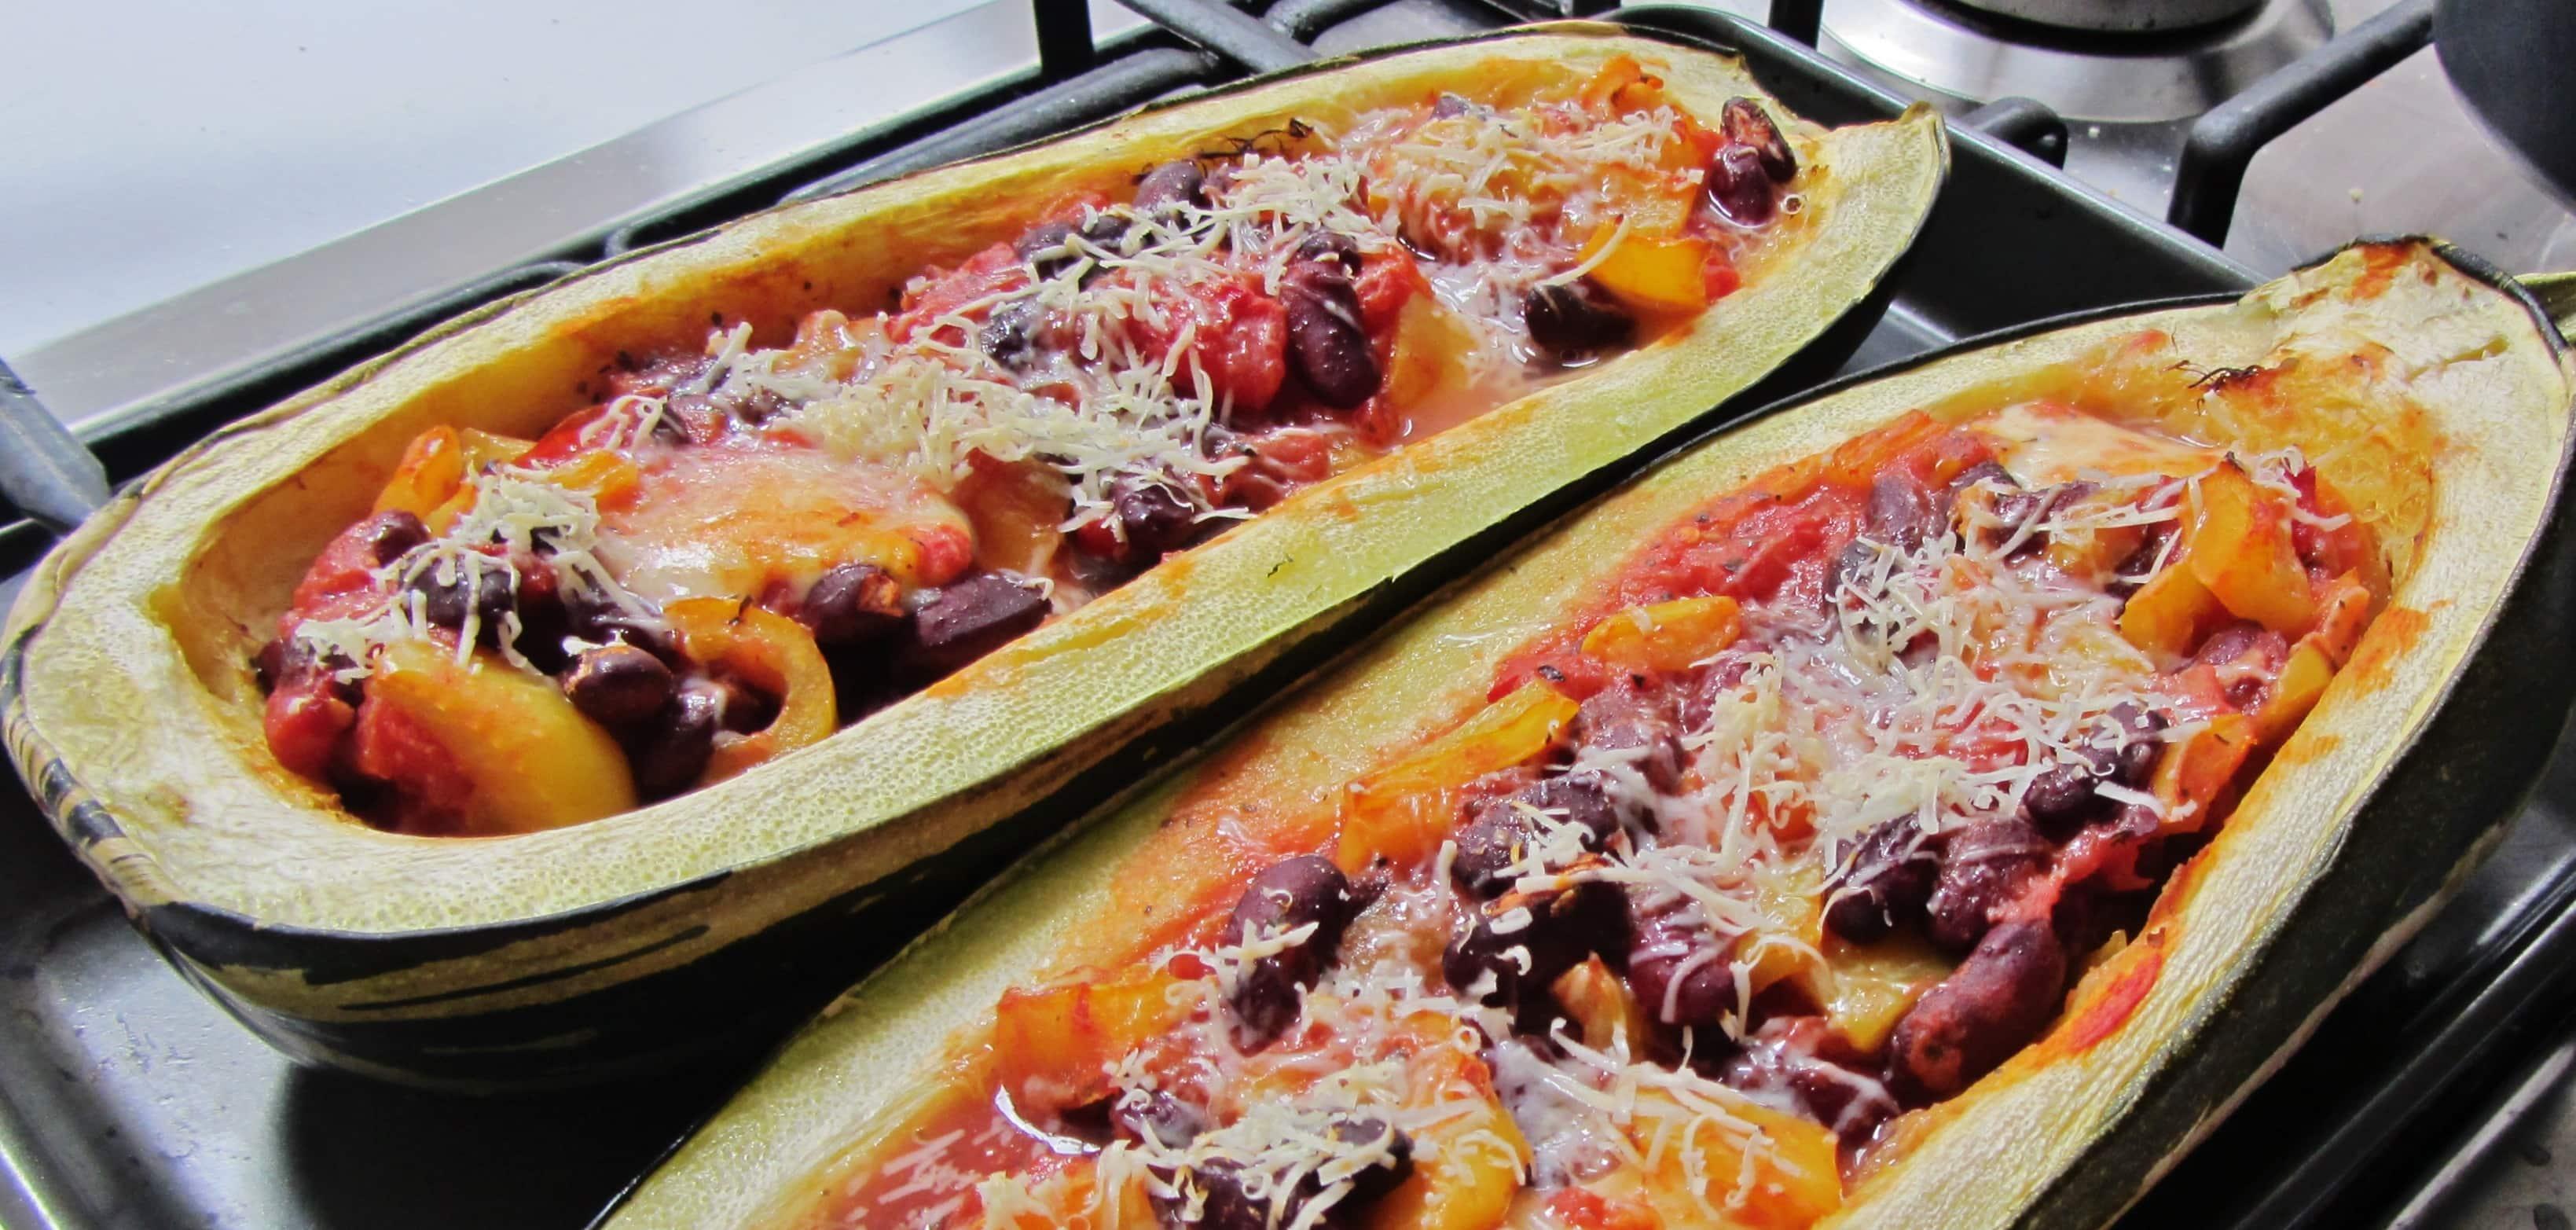 Kidney Bean and Mozzarella stuffed marrow